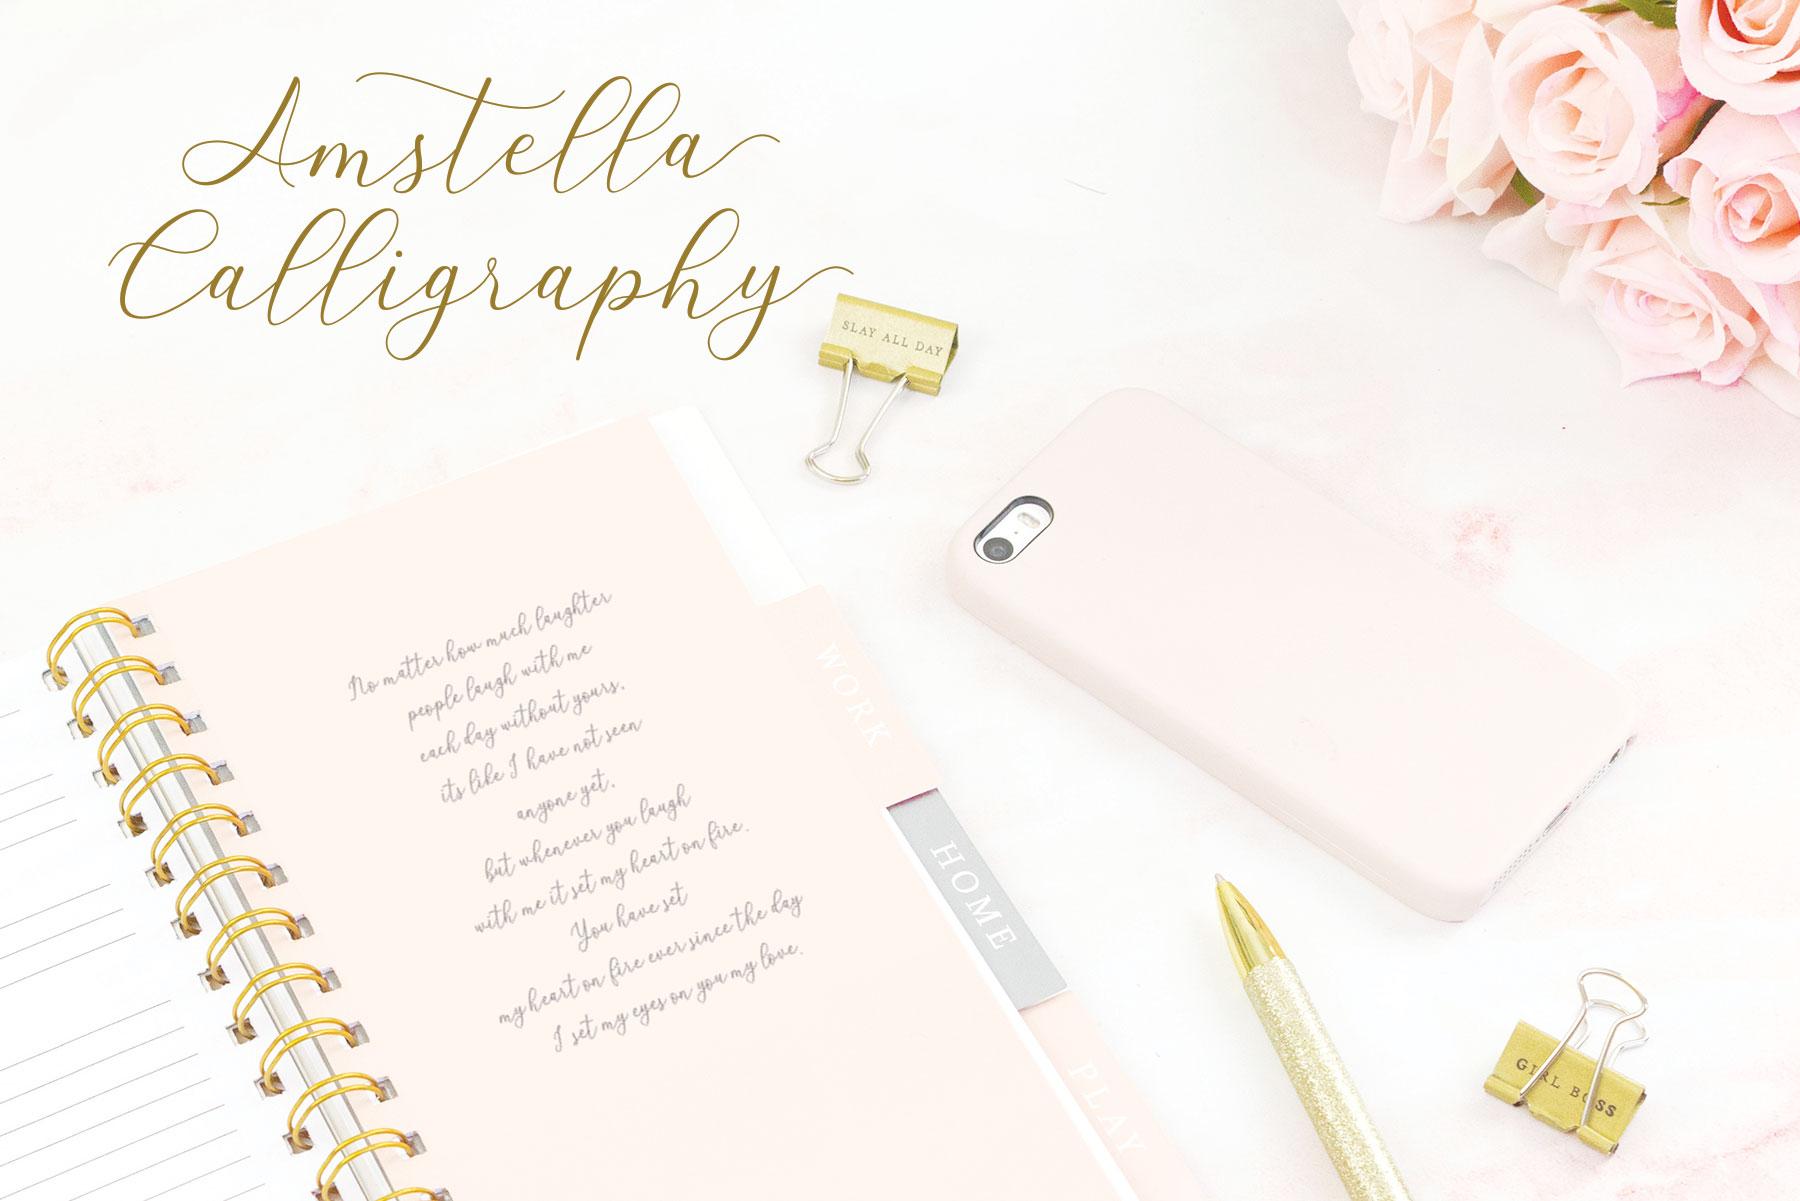 Amstella Modern Calligraphy example image 10